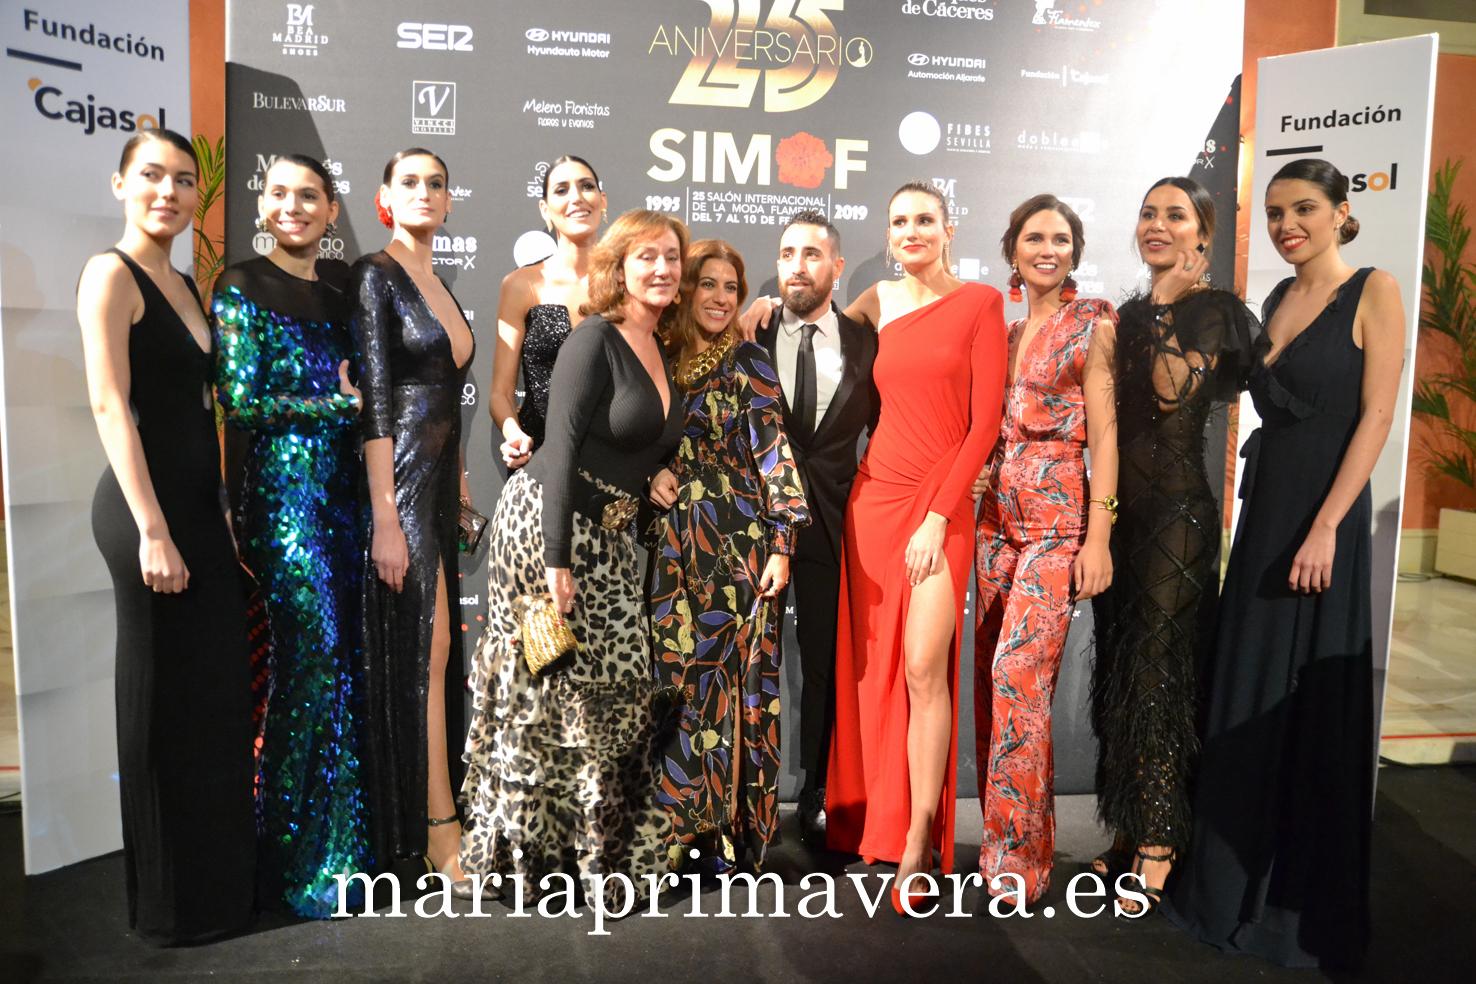 982a8e717 Gala 25 años de Simof. Sevilla 1 de Febrero 2019 | María Primavera